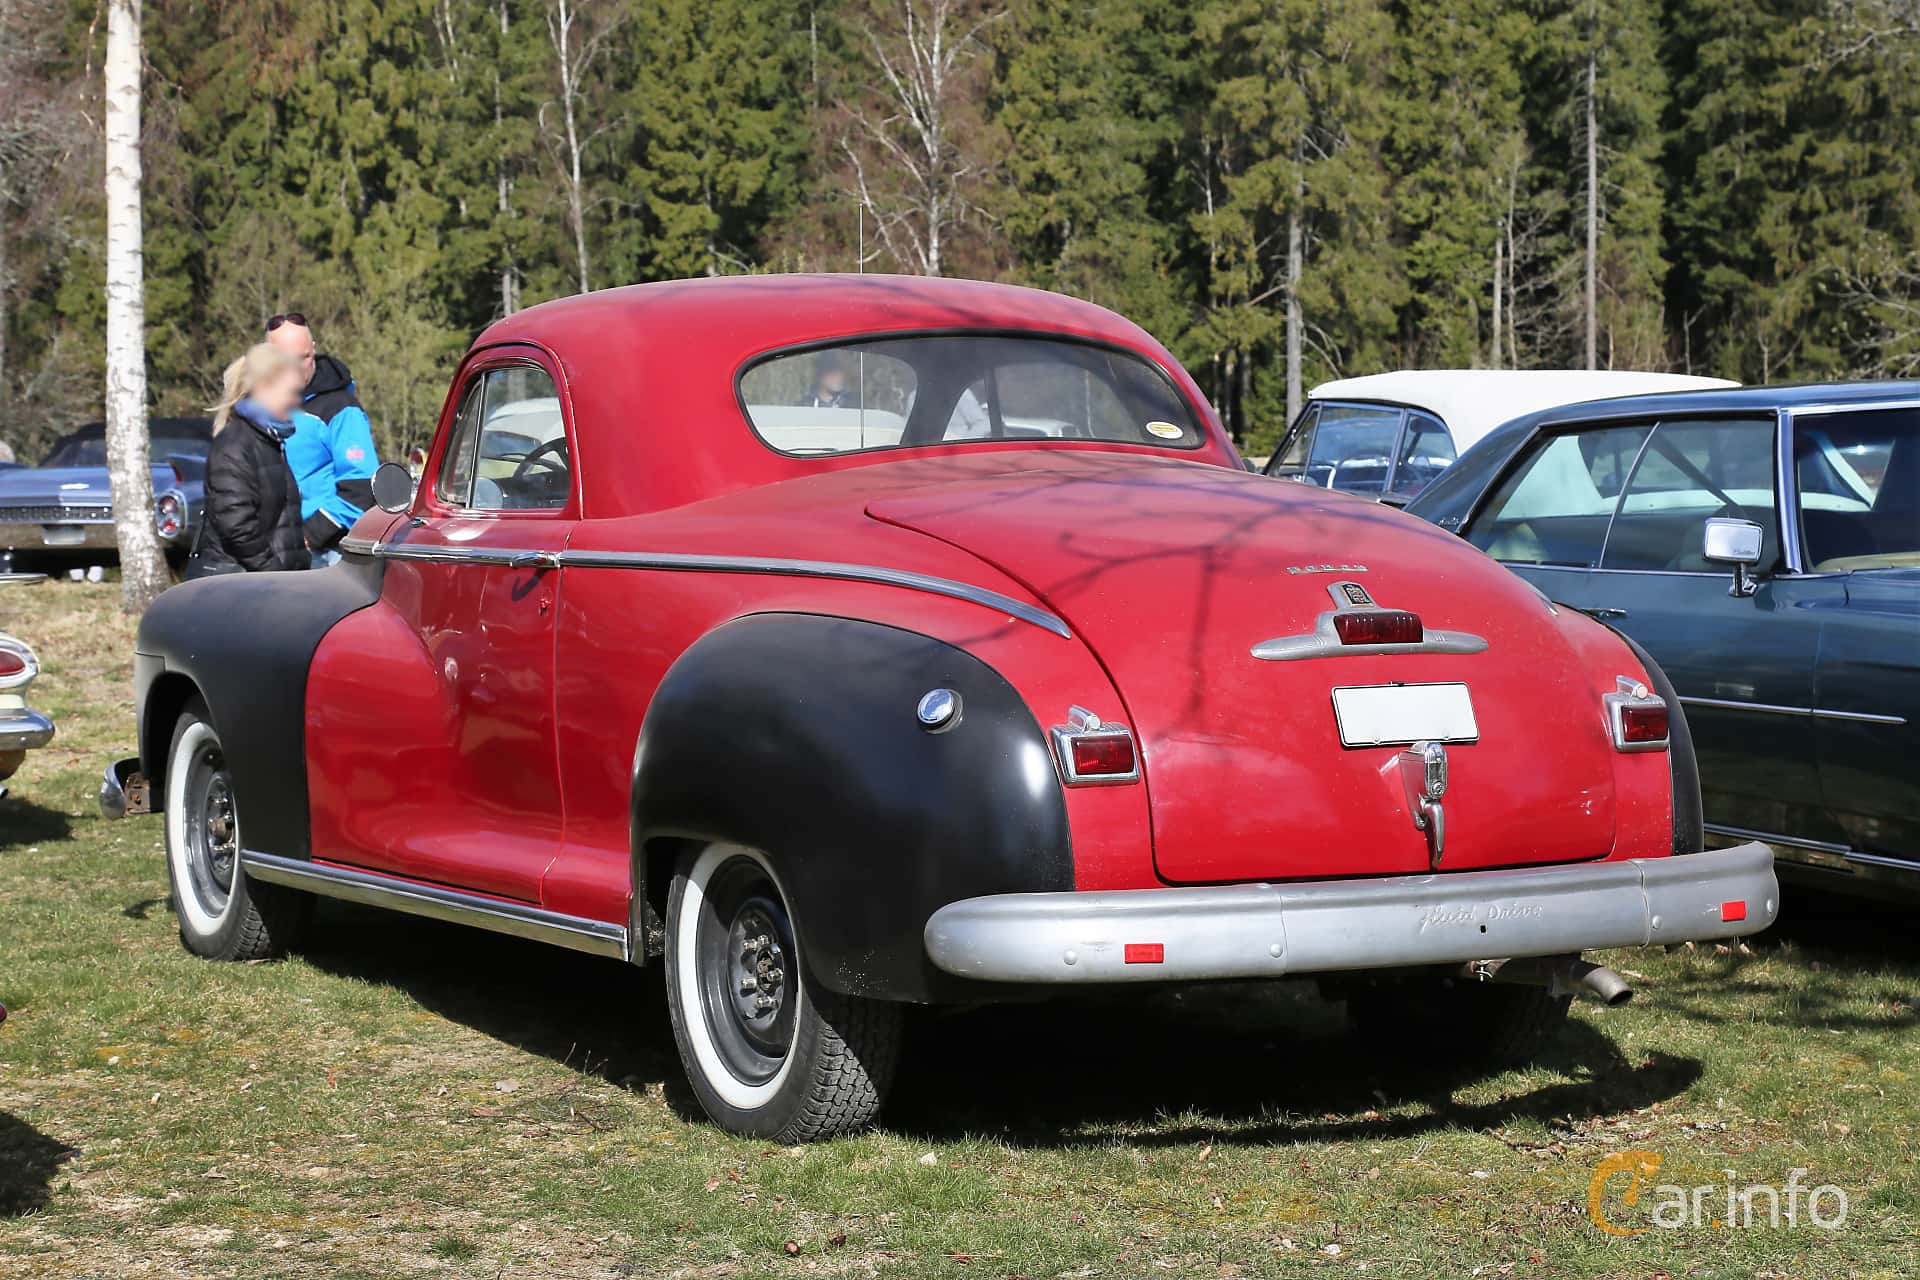 Dodge Deluxe Business Coupé 3.8 Manual, 102hp, 1948 at Uddevalla Veteranbilsmarknad Backamo, Ljungsk 2019